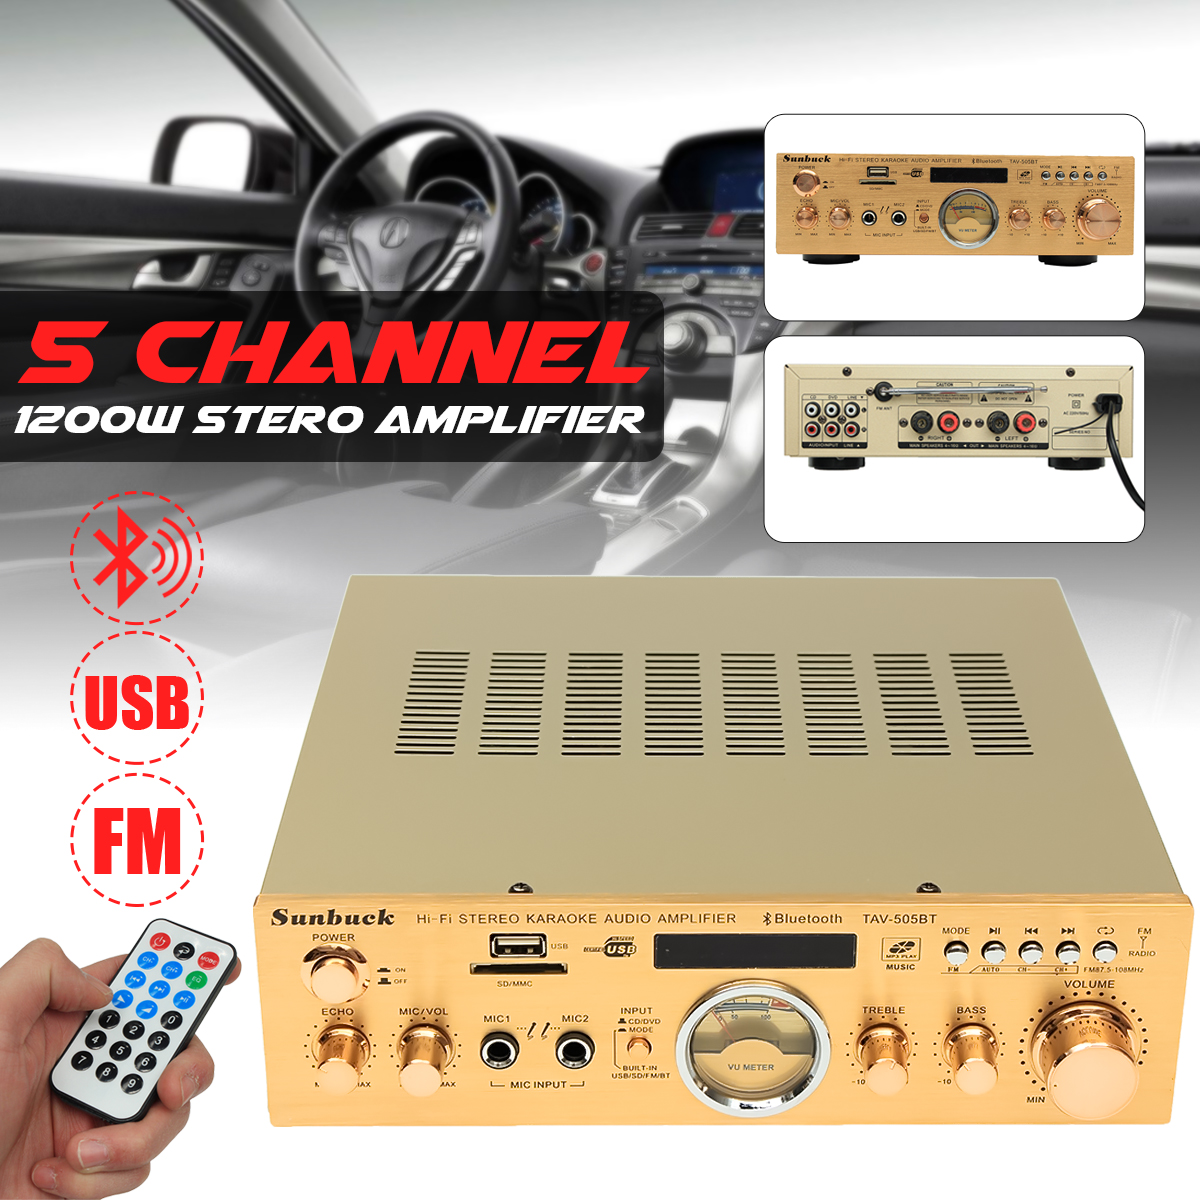 Sunbuck TAV-505BT 400W+400W HiFi Bluetooth Power VU Meter Amplifier Stereo Karaoke FM USB SD hyundai i700 bluetooth v3 0 speaker w mic tf fm voice prompt black white 32gb max